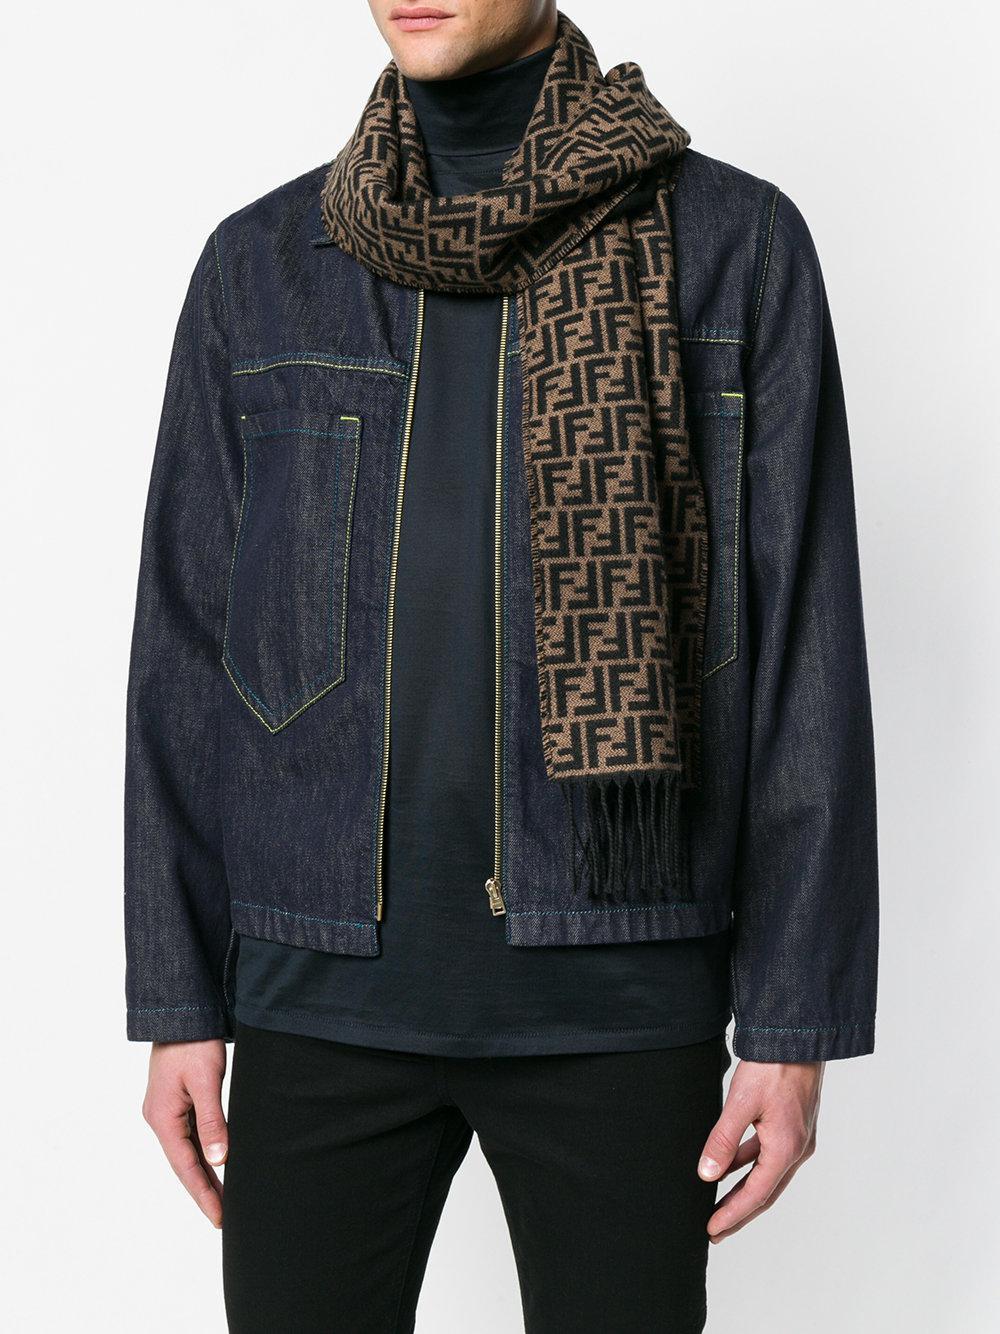 dcd217e96 order fendi knit scarf mens be7f7 8660a